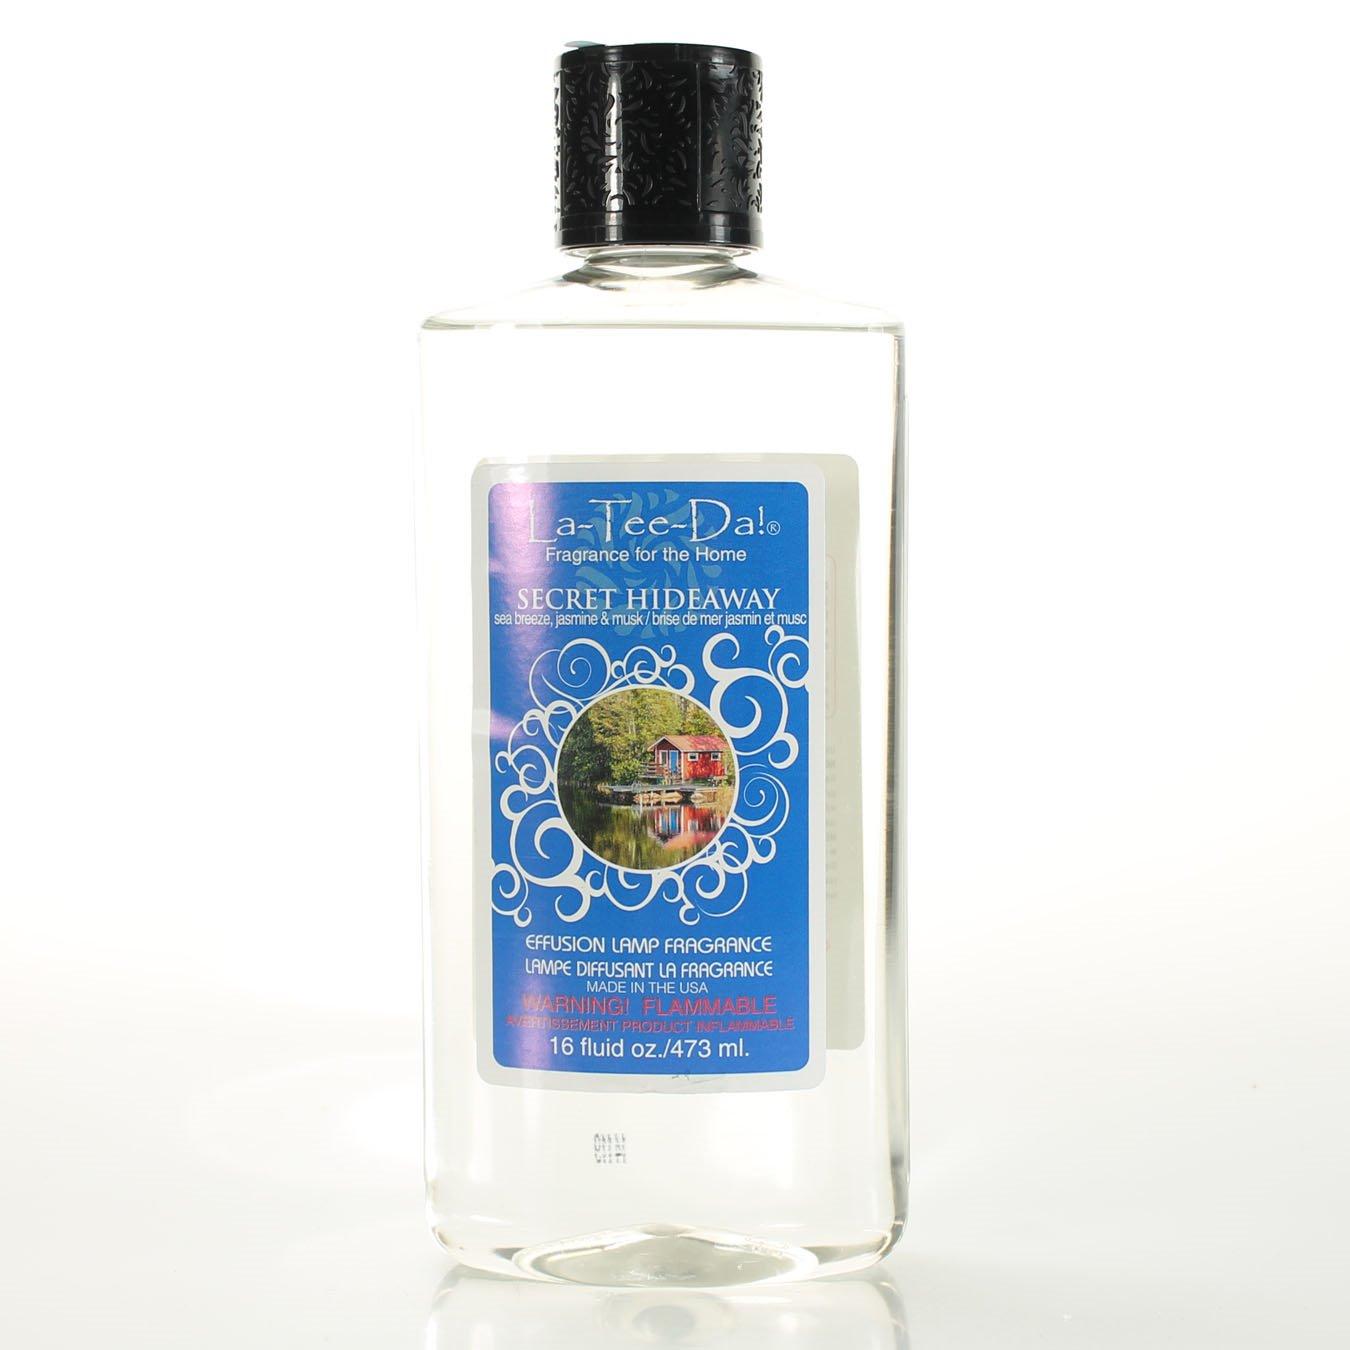 La Tee Da Fuel Fragrance Secret Hideaway (16 oz)